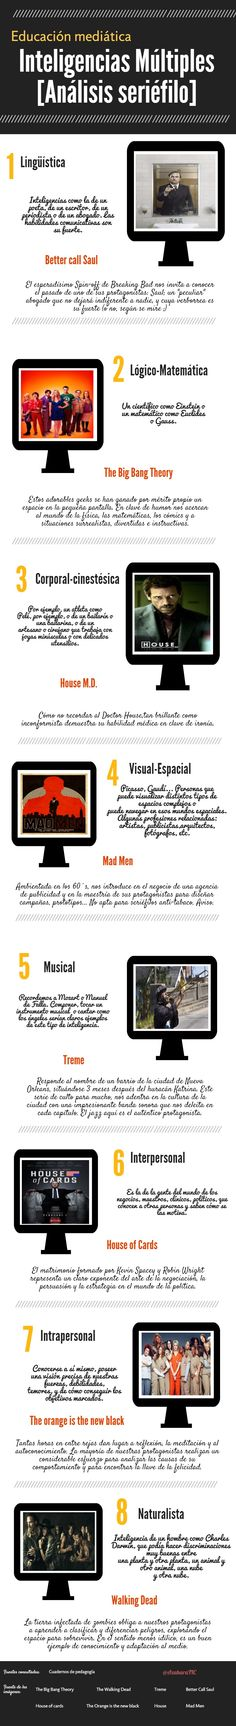 Series e IM   Piktochart Infographic Editor